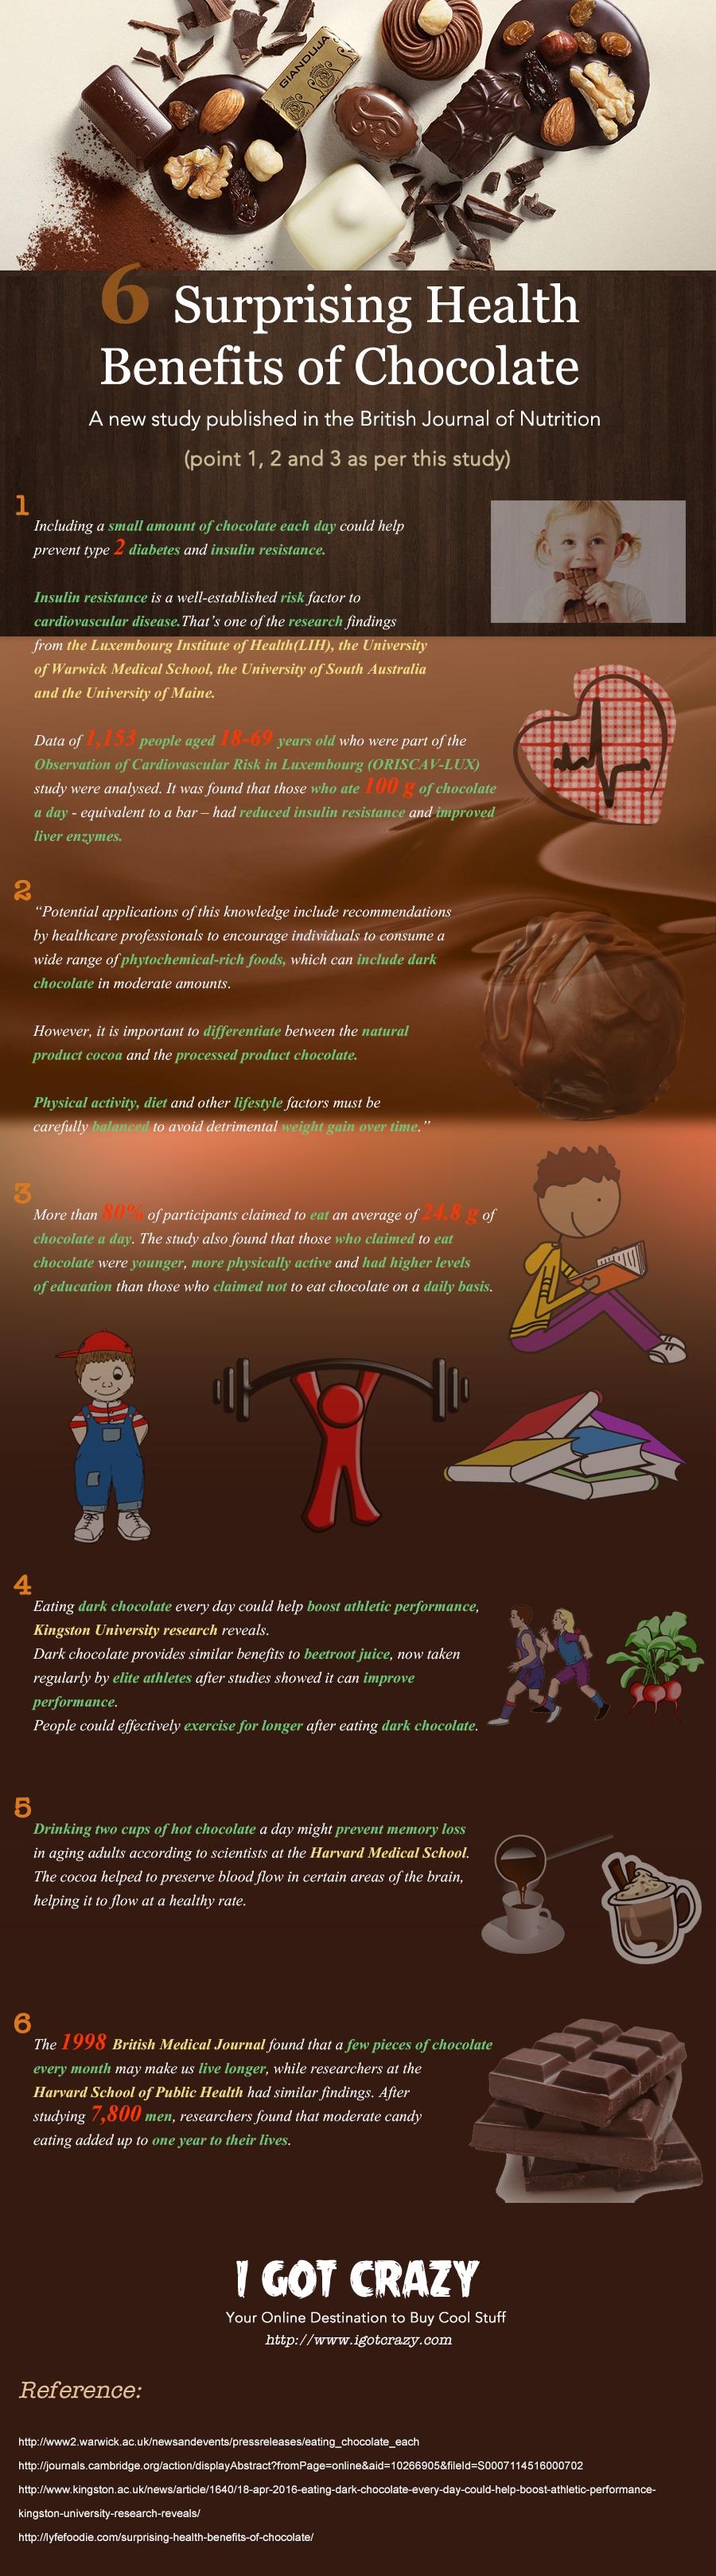 Chocolate Health Benefits Infographic